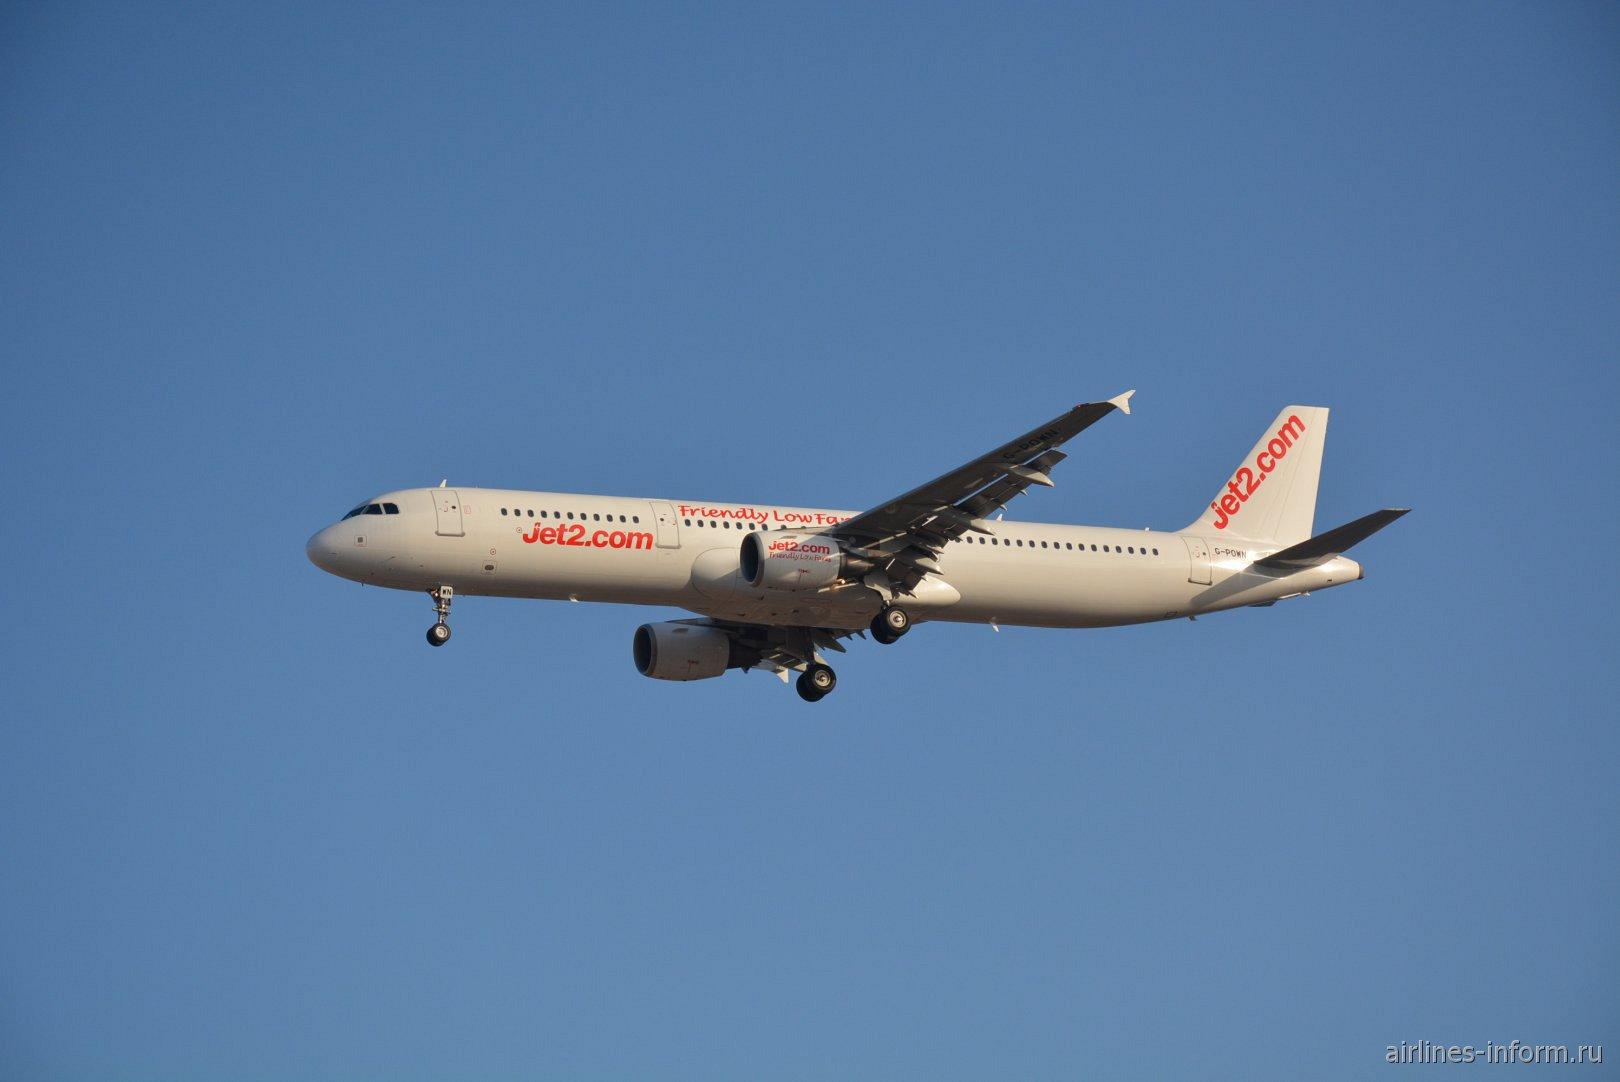 Airbus A321-200 G-POWN авиакомпании Jet2.com